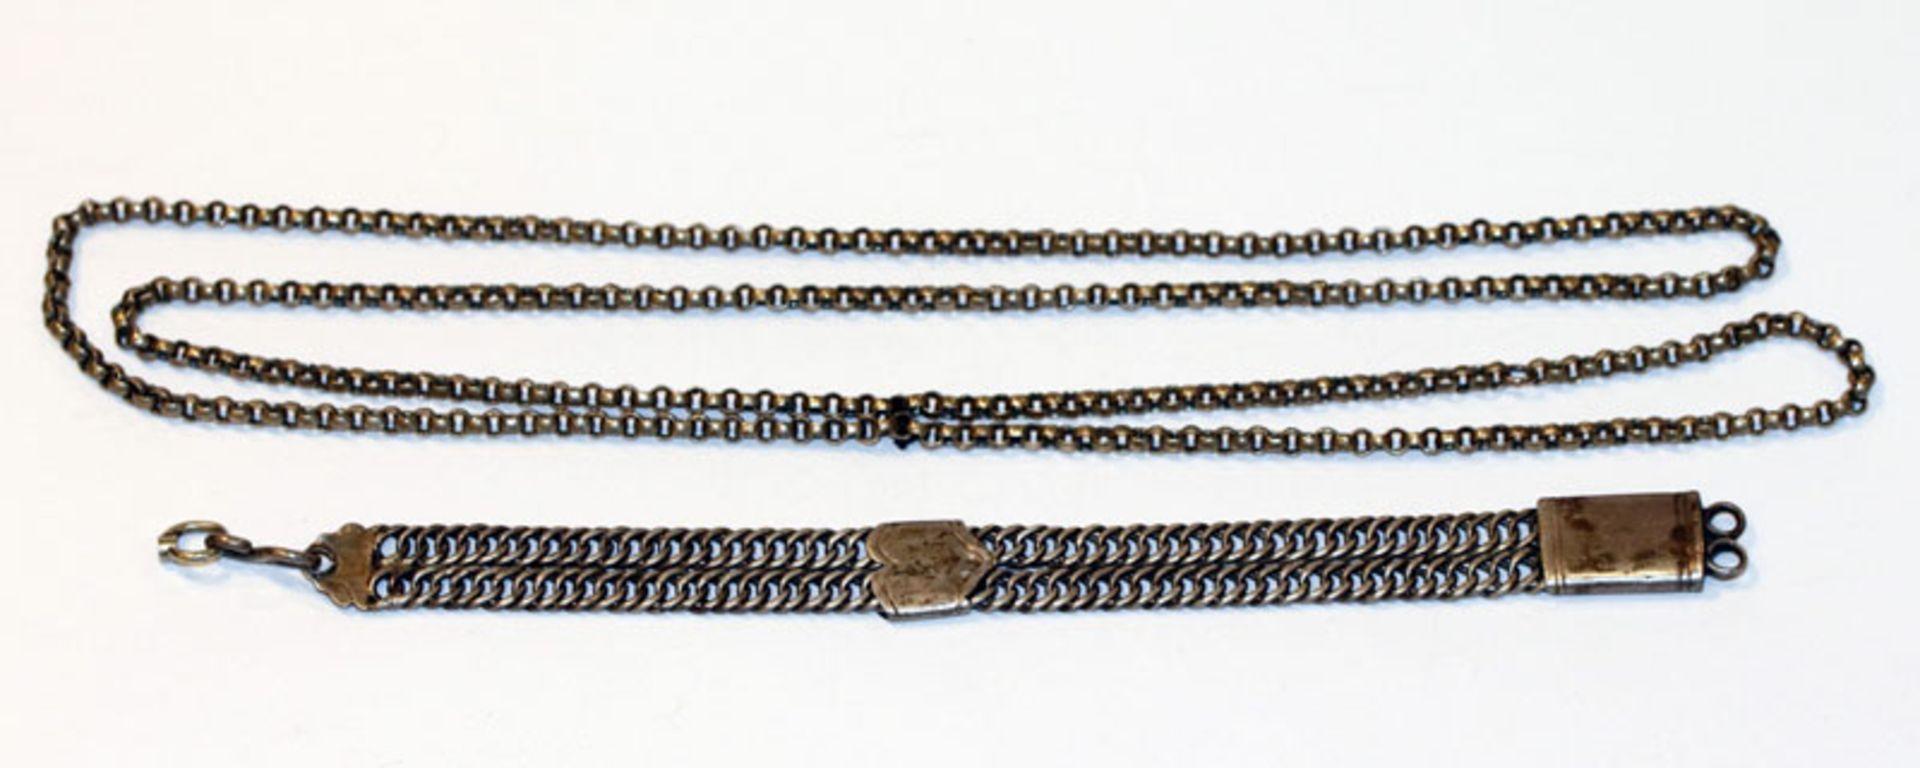 Antike Silber Uhrenkette, nicht komplett, L 20 cm, und Erbsenkette, L 100 cm, 19. Jahrhundert,